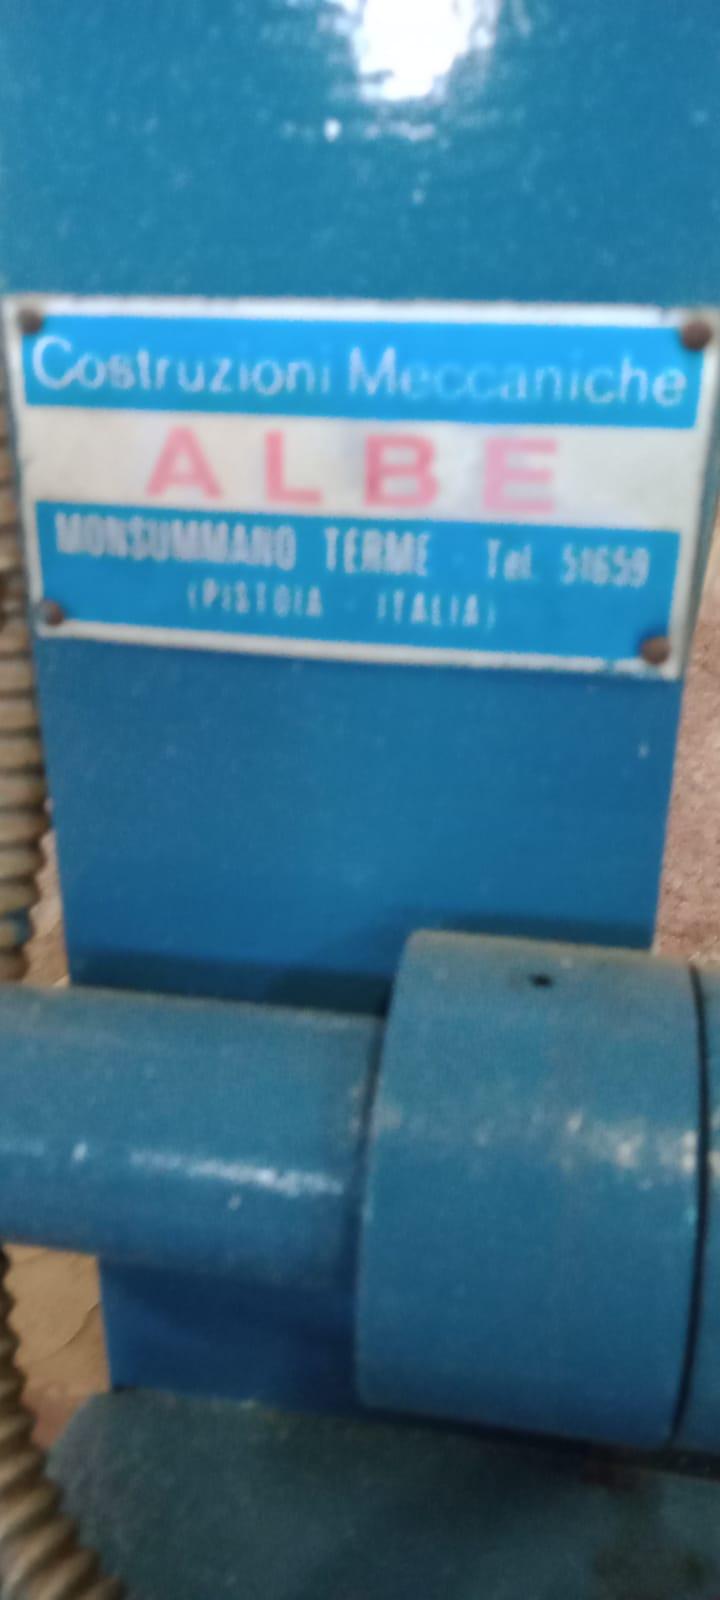 rettifica  in vendita - foto 3